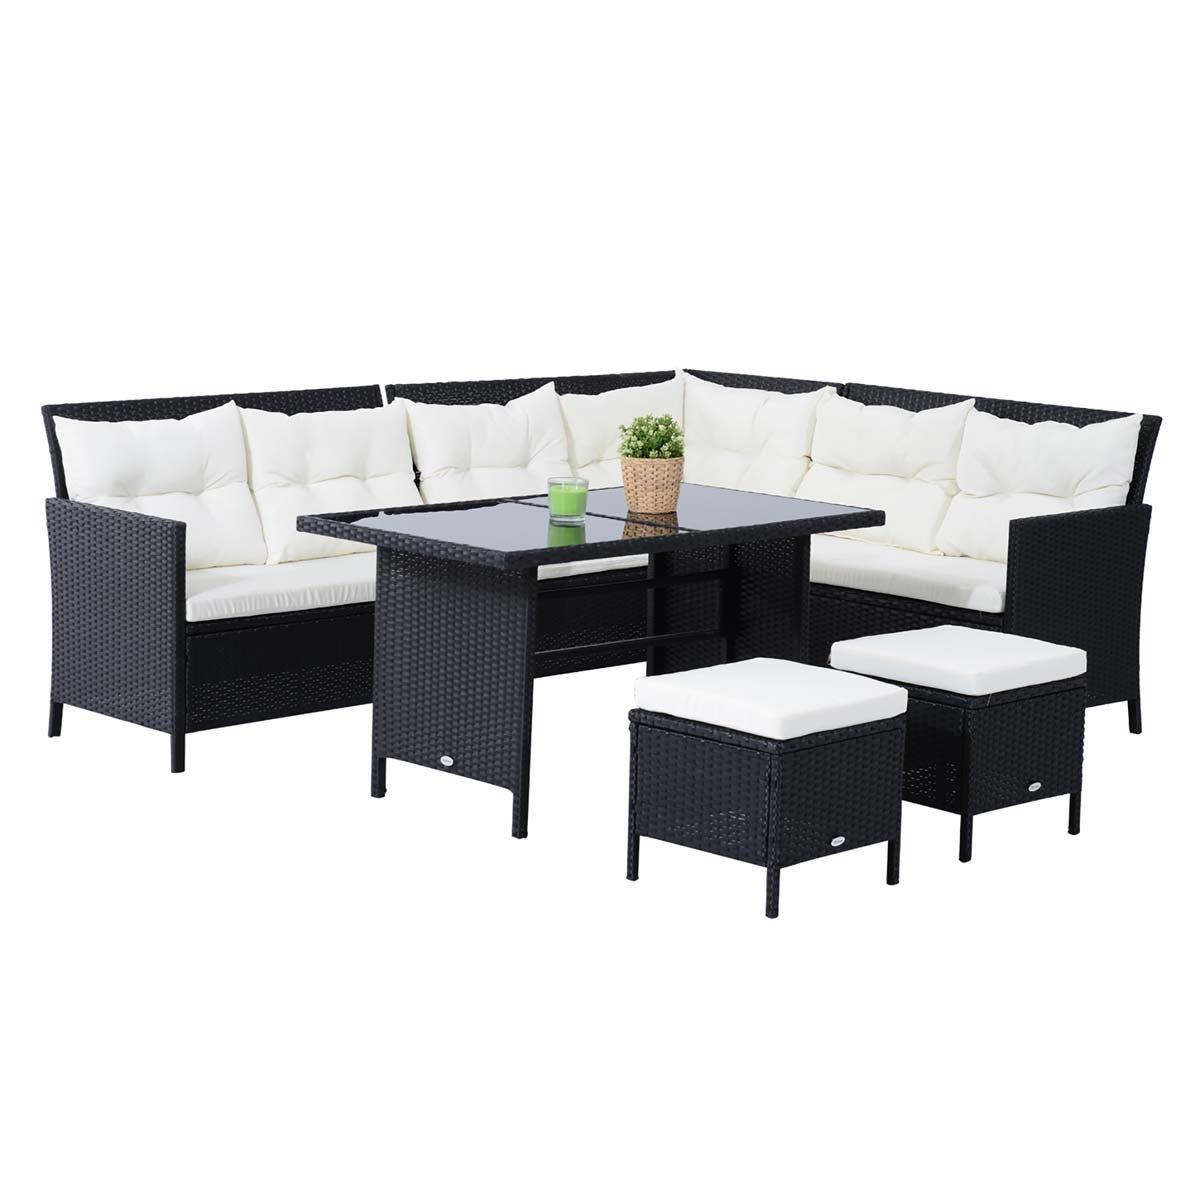 Outsunny 6 Piece Modular Rattan Sofa Set - Black